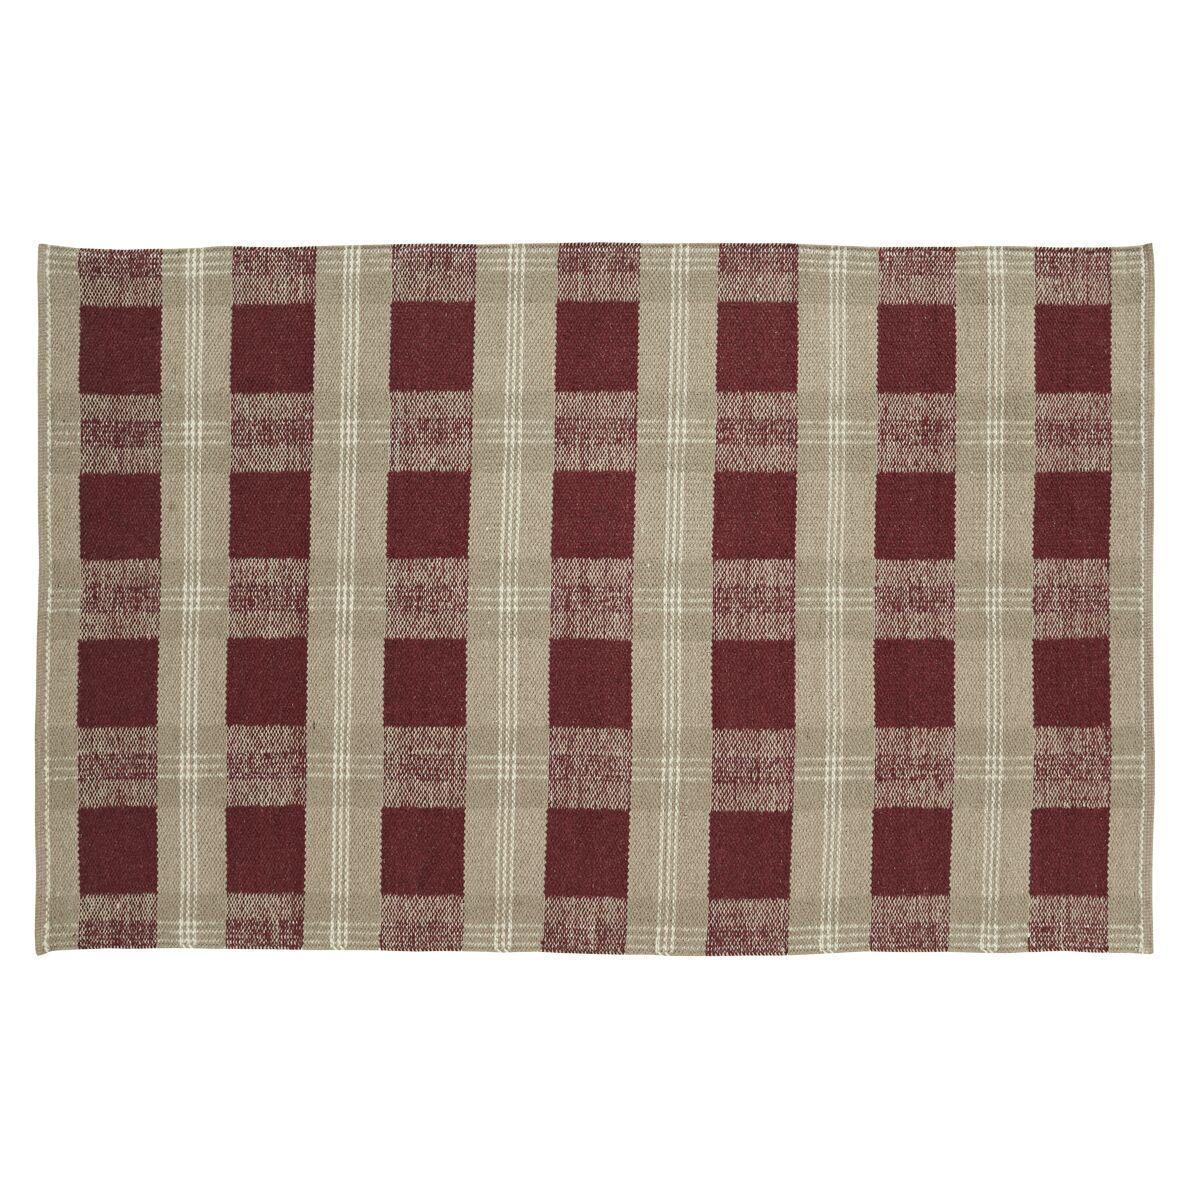 Rayle Elmwood/Cream Area Rug Rug Size: 8' x 11'